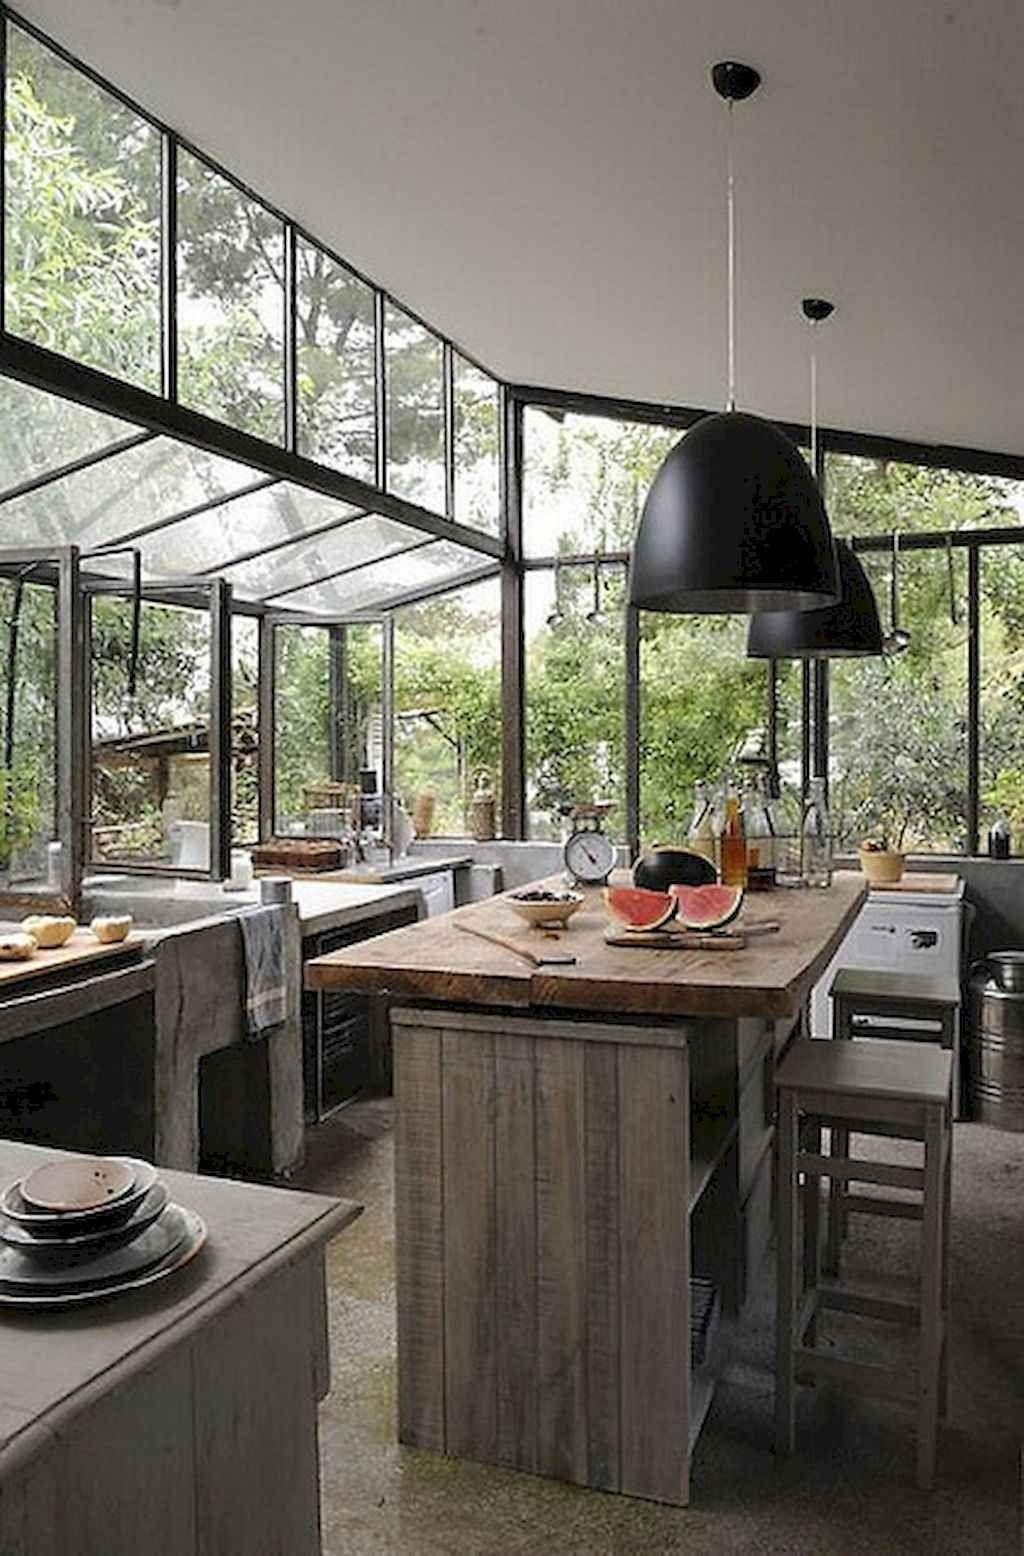 120 Modern Rustic Farmhouse Kitchen Decor Ideas 51 kitchen #120 #modern #rustic #farmhouse #kitchen #decor #ideas #51